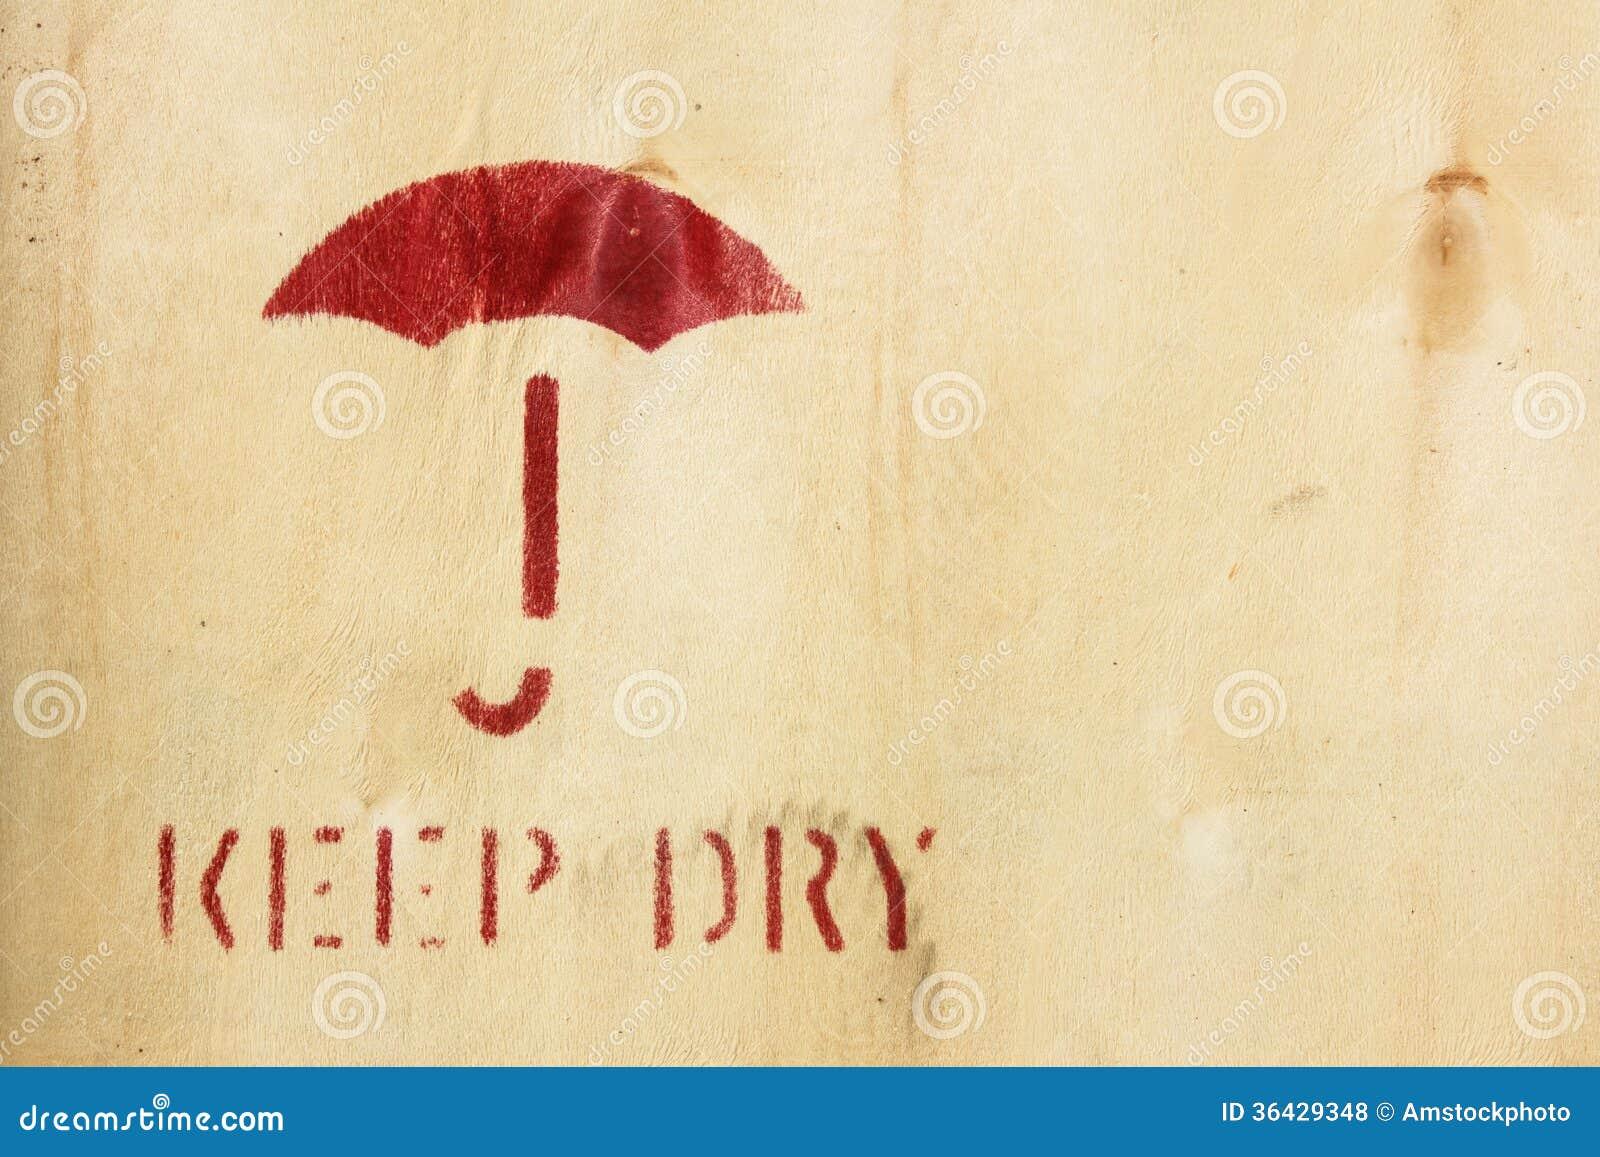 Umbrella Symbol On Box Keep Dry Sign Royalty Free Stock